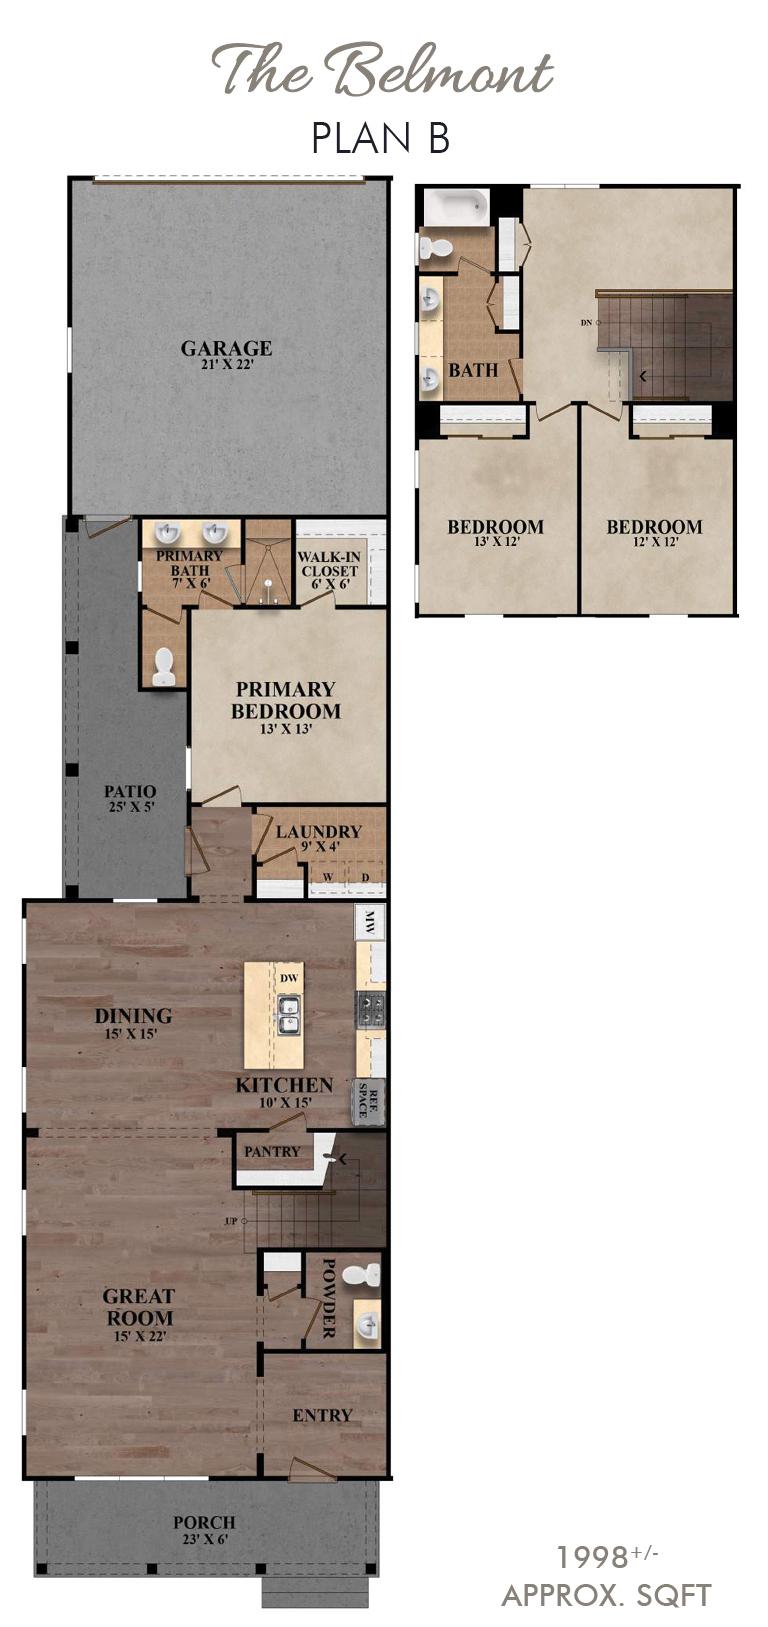 The Belmont - Plan B First Floor